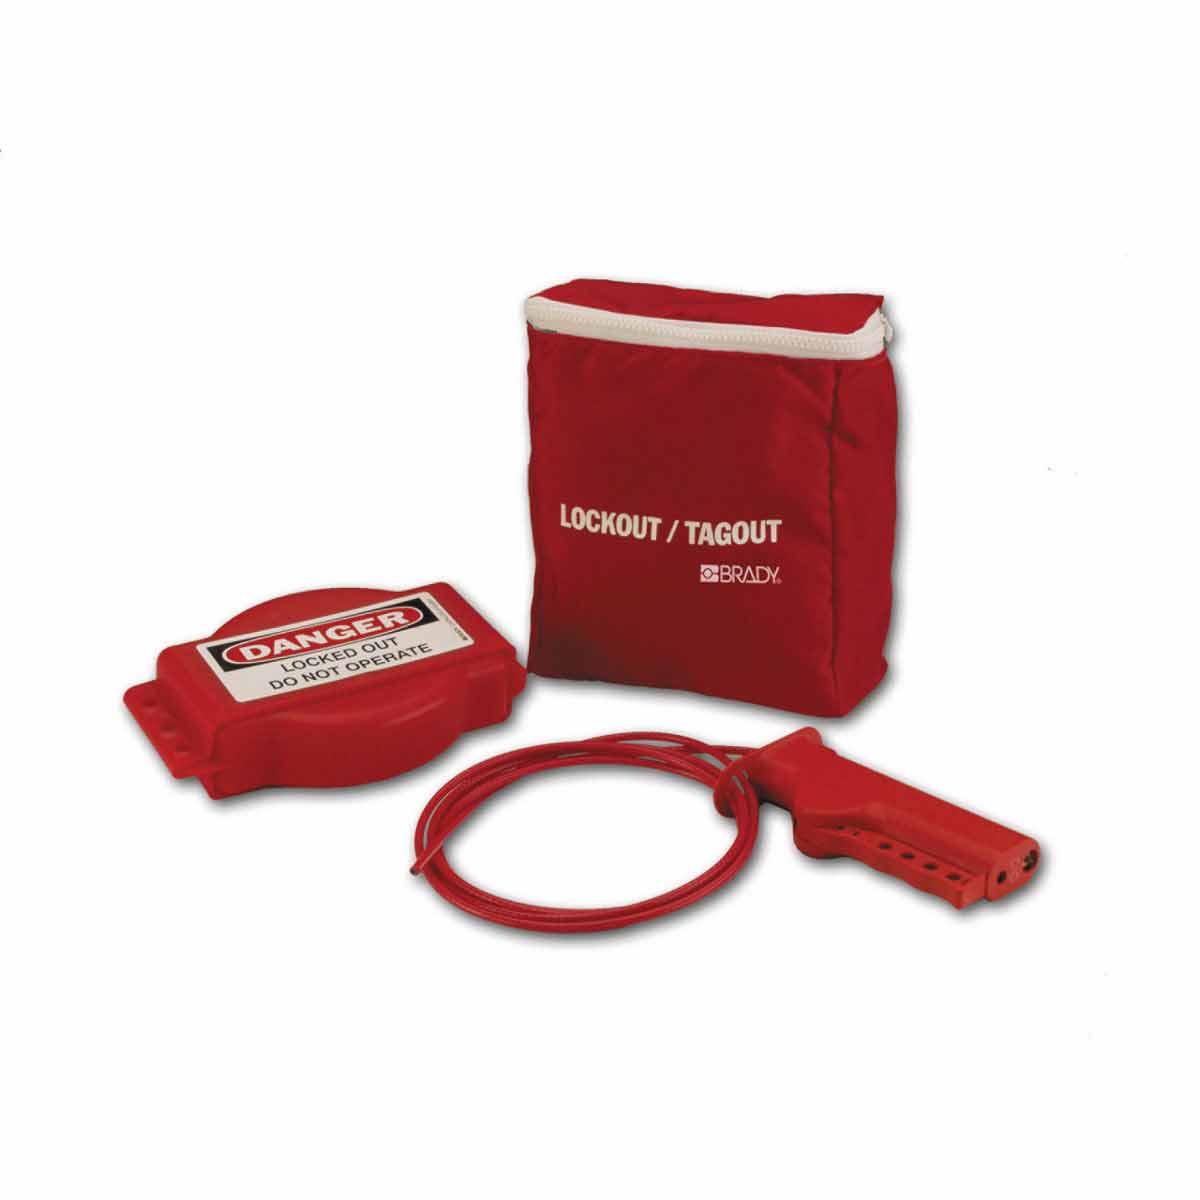 Brady® 101416 Gate Valve Lockout Kit, 3 Pieces, 8 in H x 7 in W, Language: English